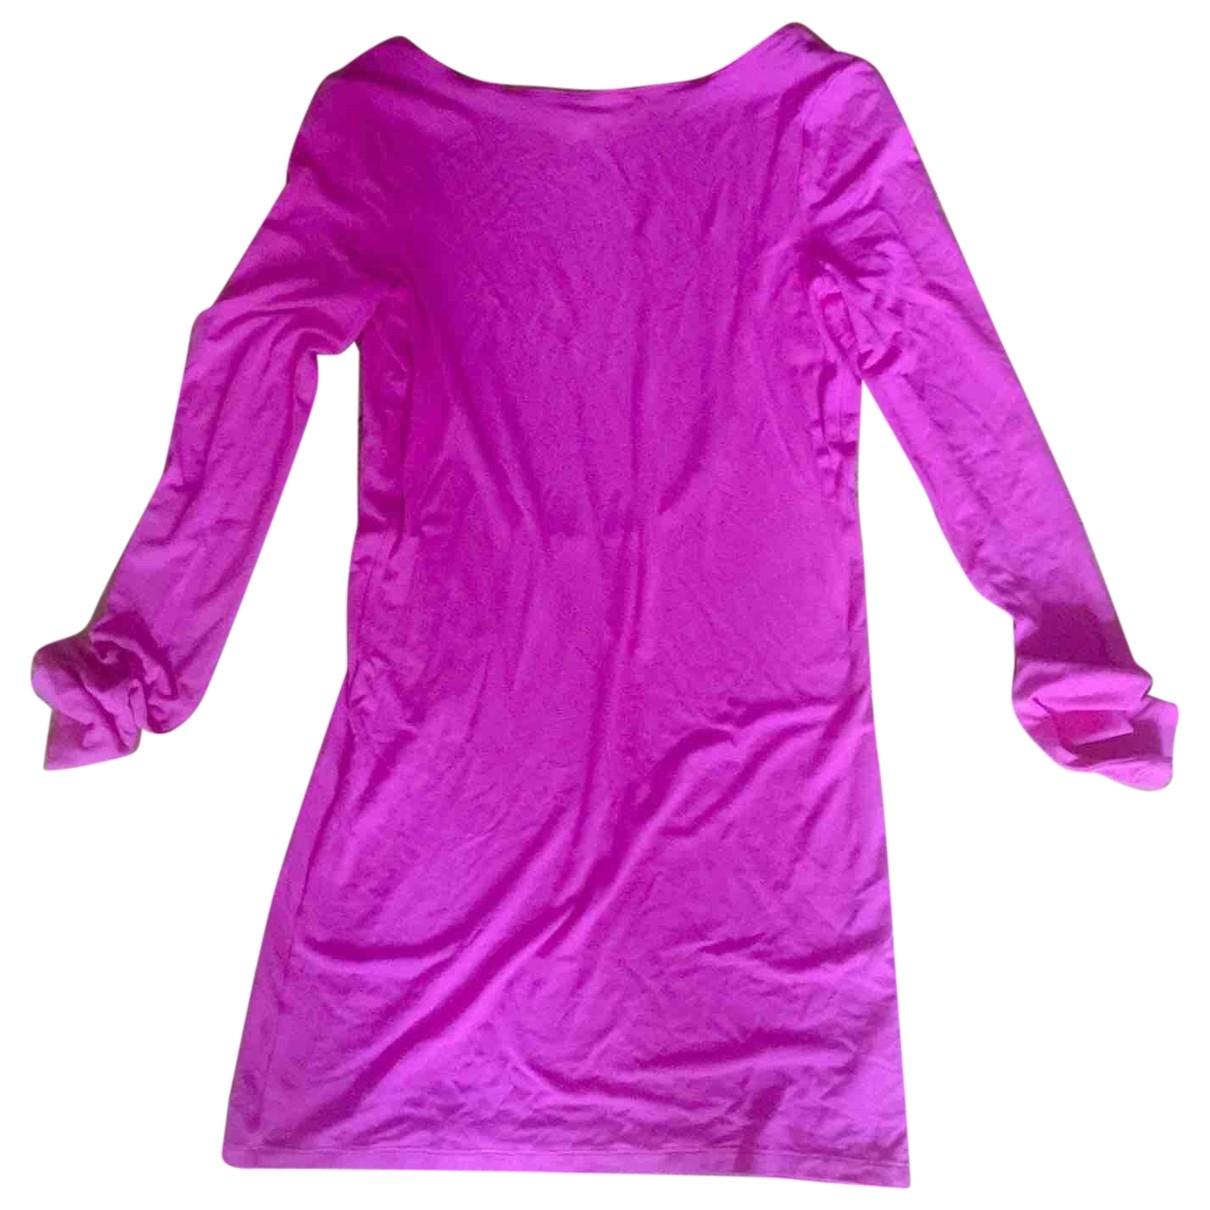 Patrizia Pepe \N Pink Cotton - elasthane dress for Women 2 0-5